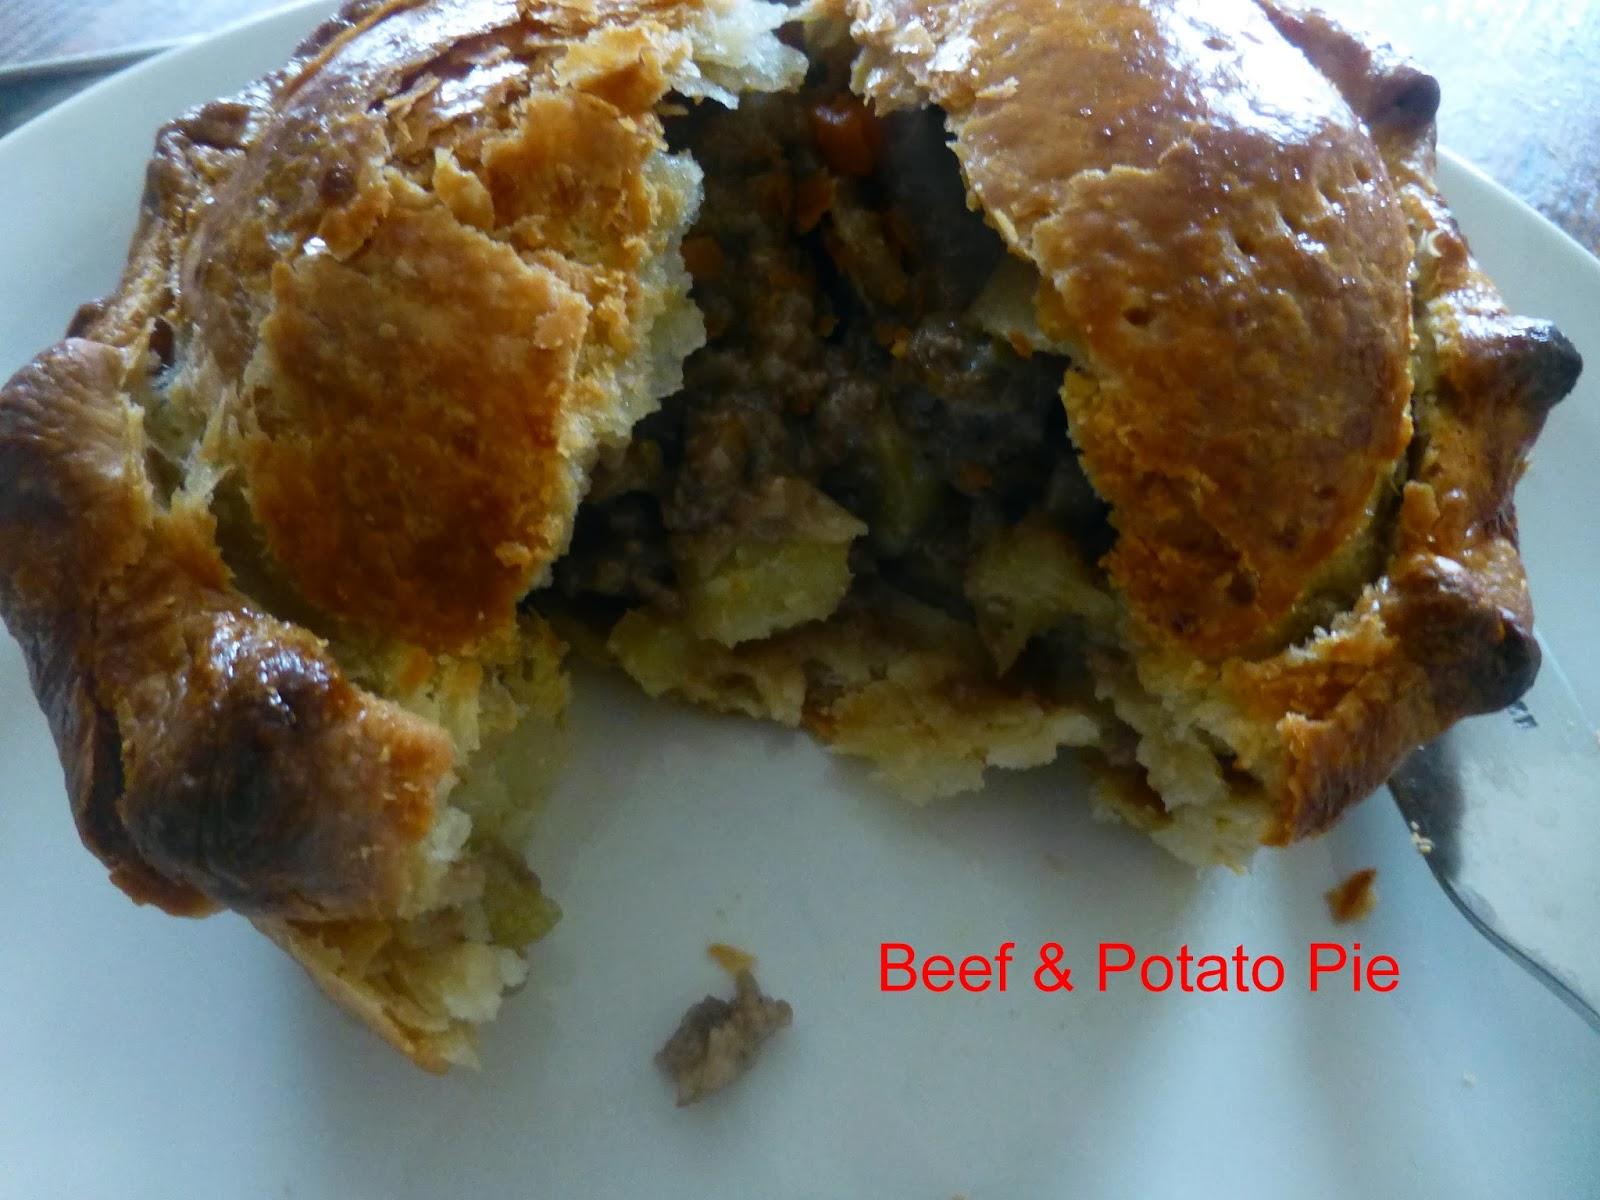 RESTAURANTS AND FOOD: Tuscany Bistro